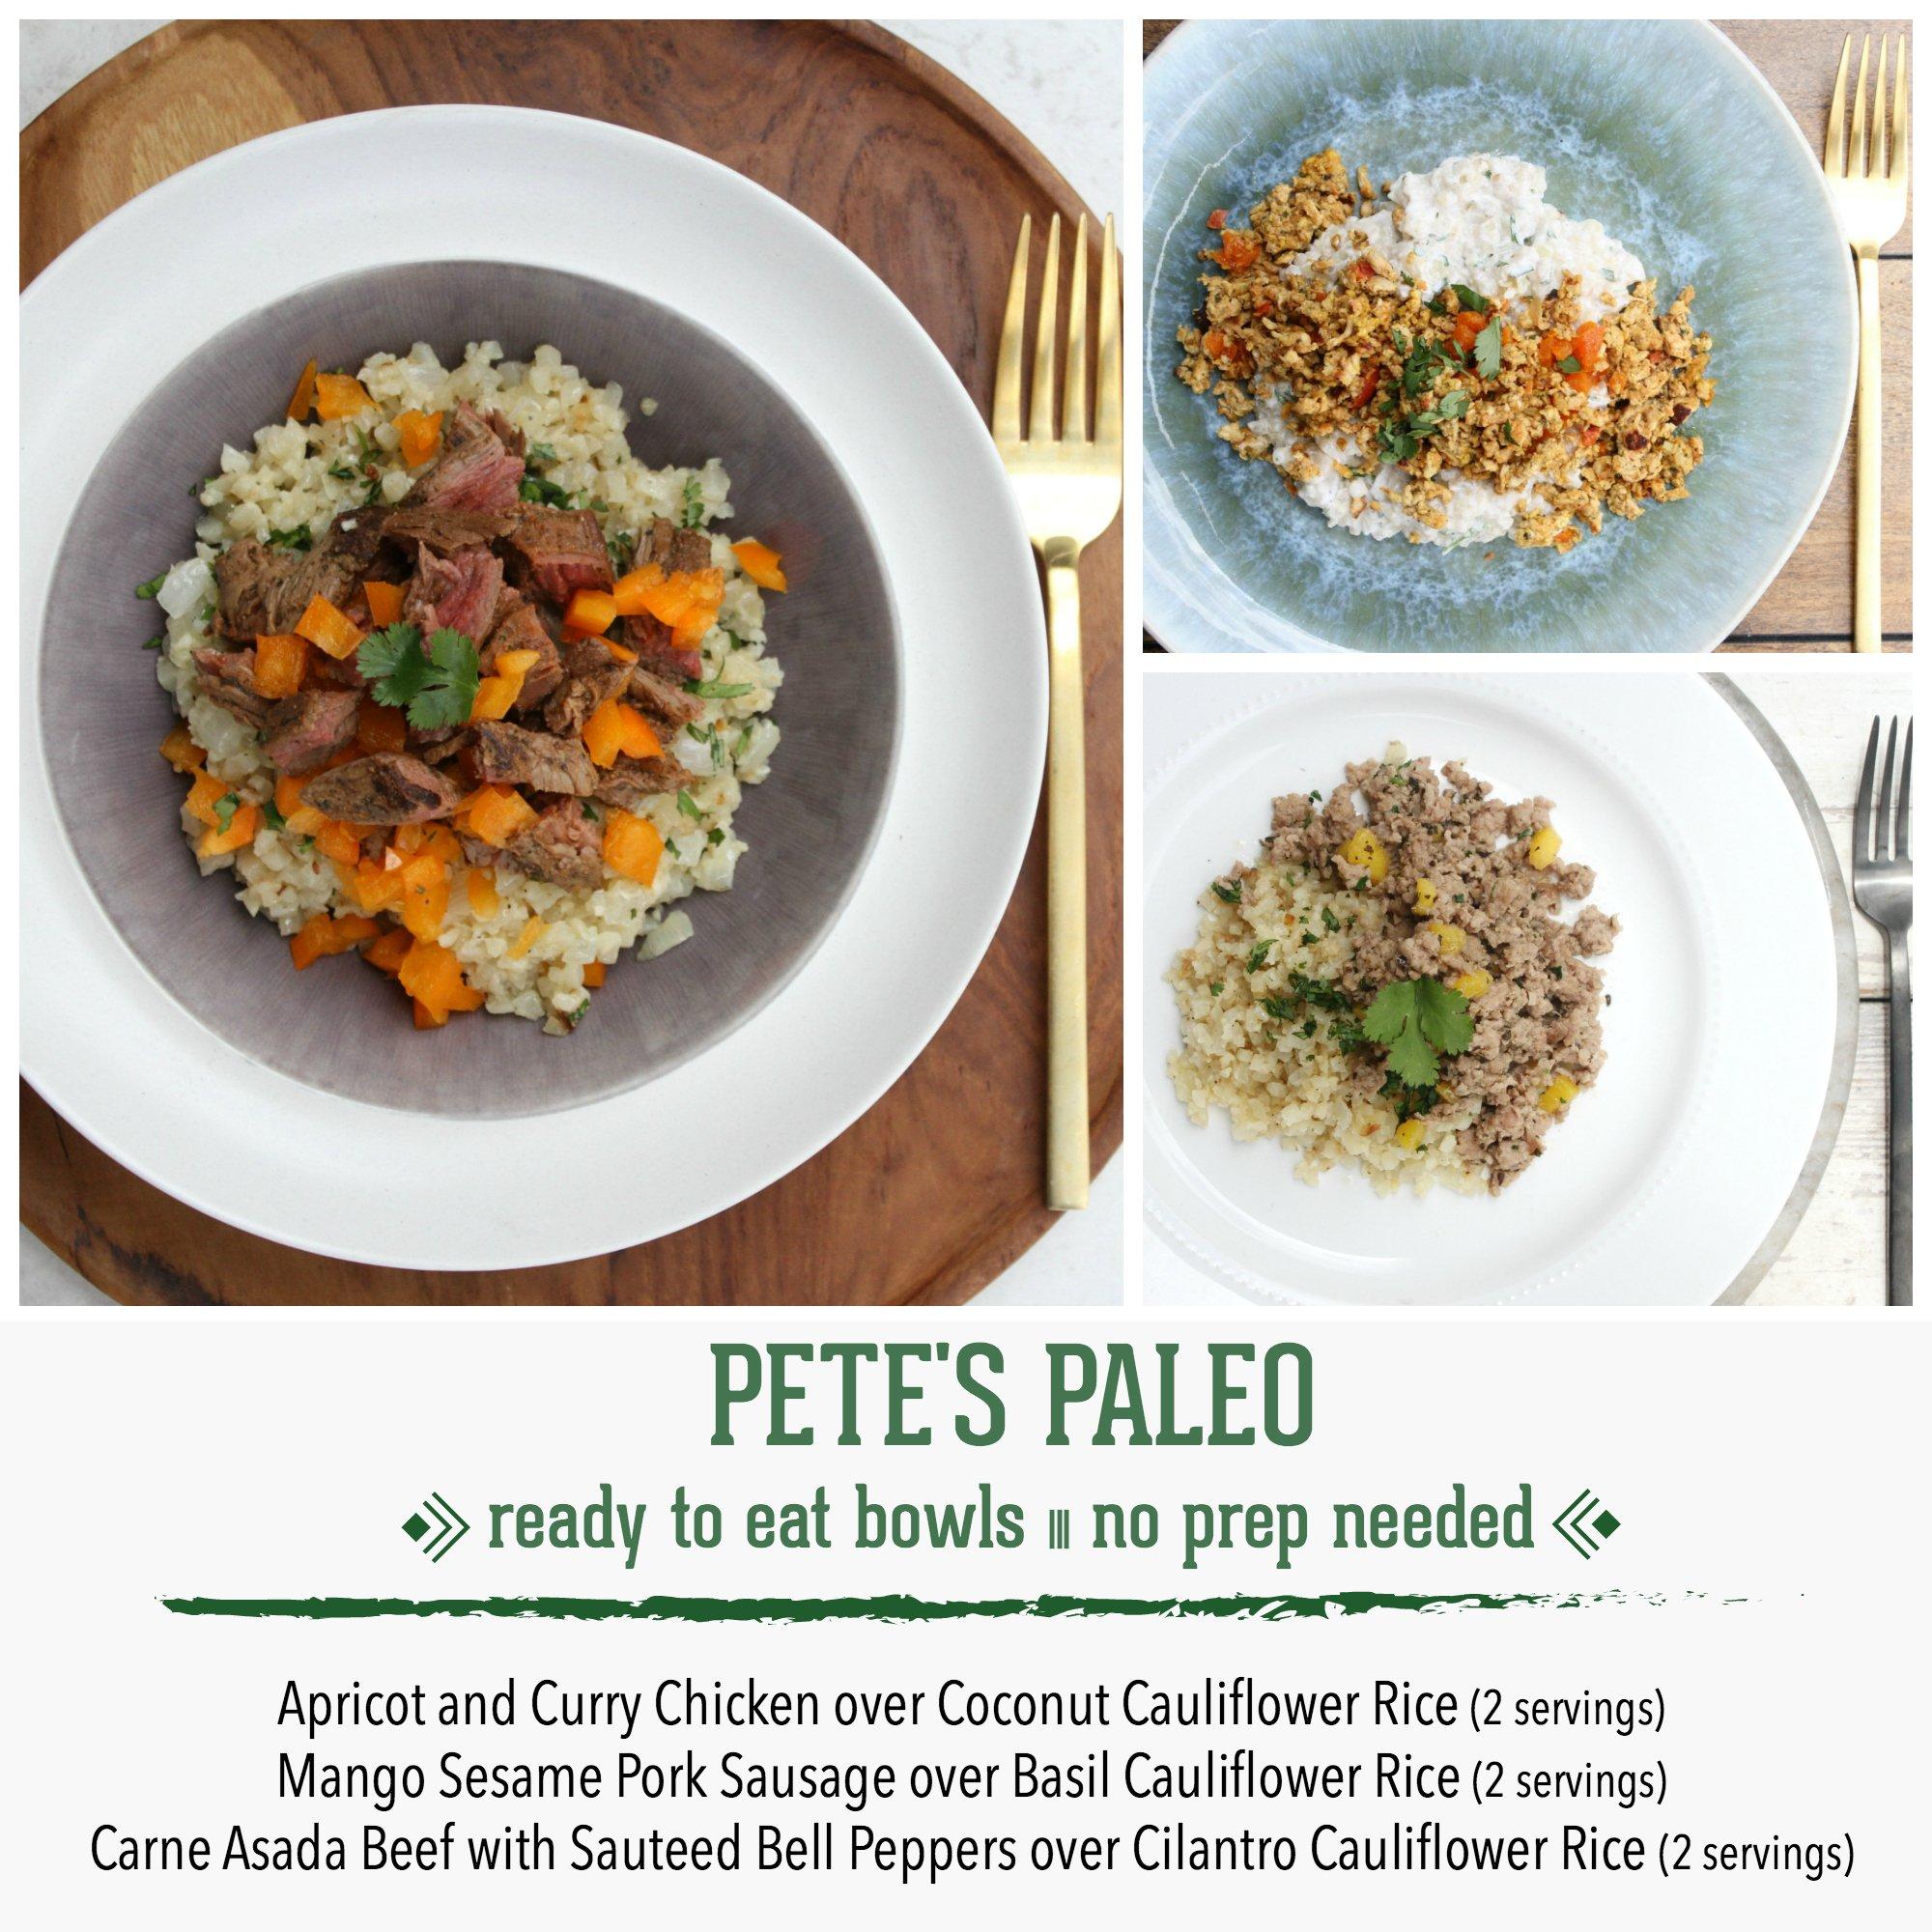 Pete's Paleo No Prep Organic Cauliflower Rice Bowls, Bundle of 6 (2 Servings of Each Bowl)